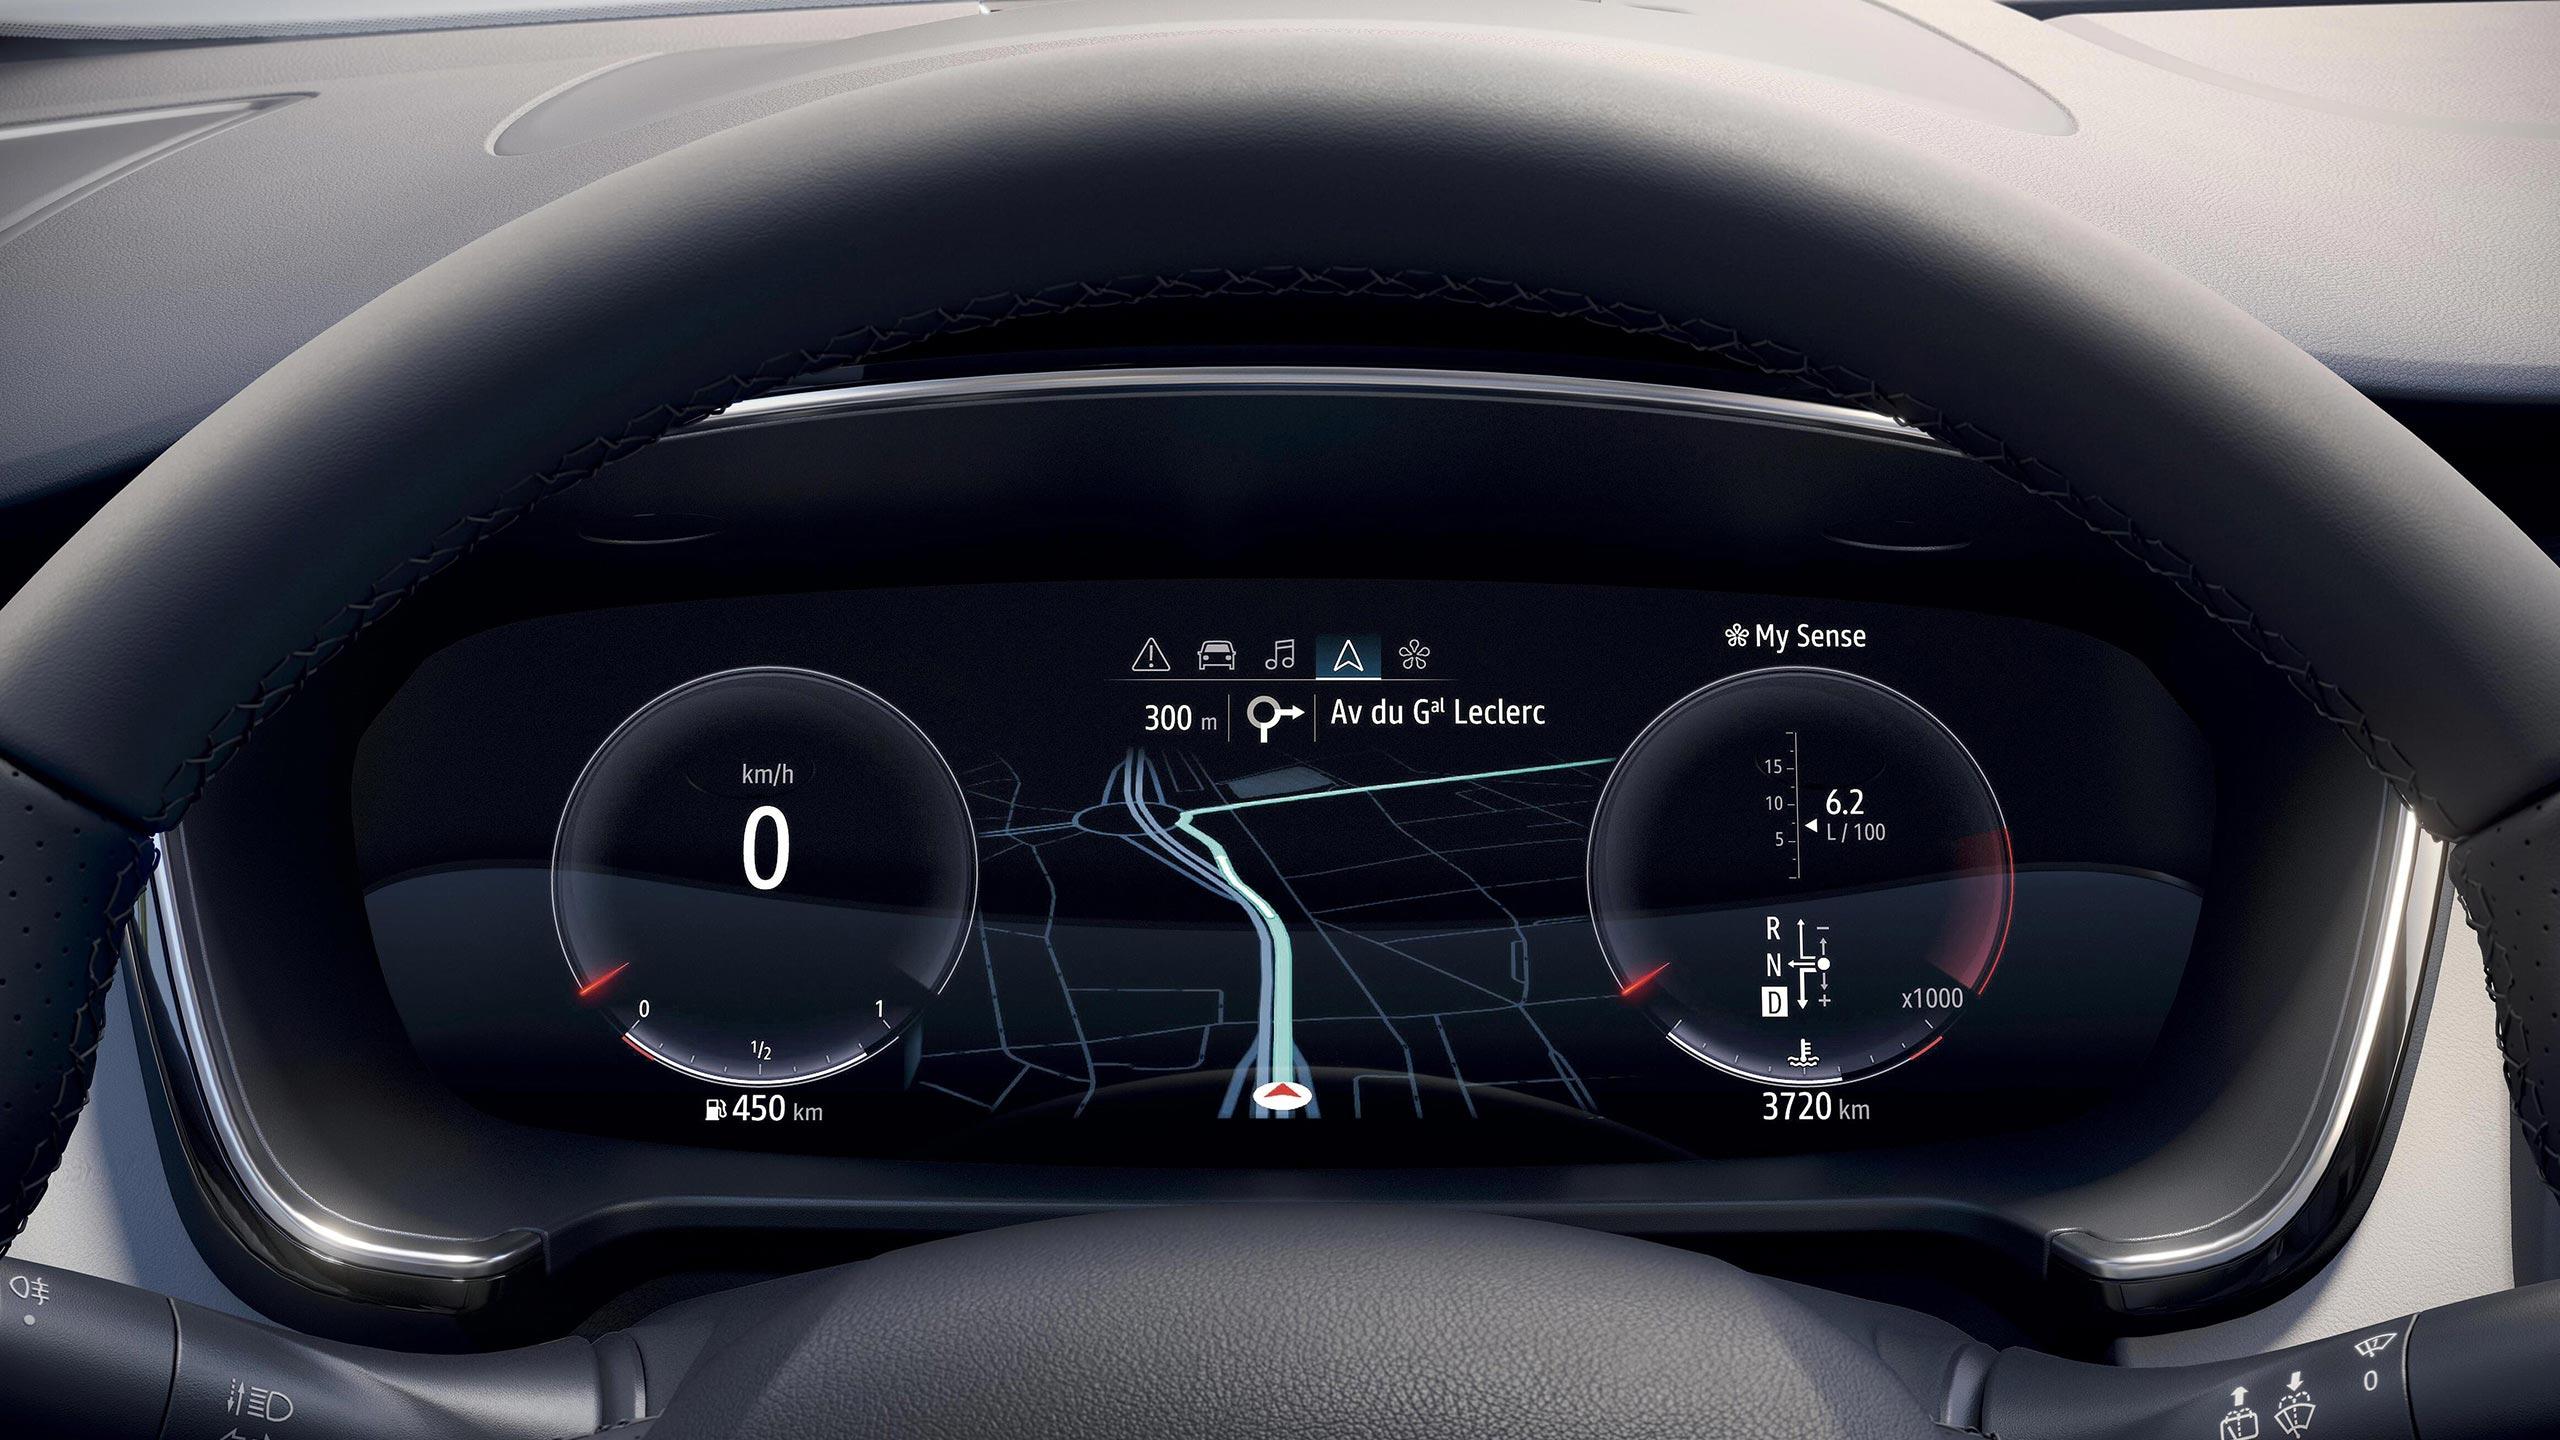 Renault Talisman Autozentren P&A-Preckel